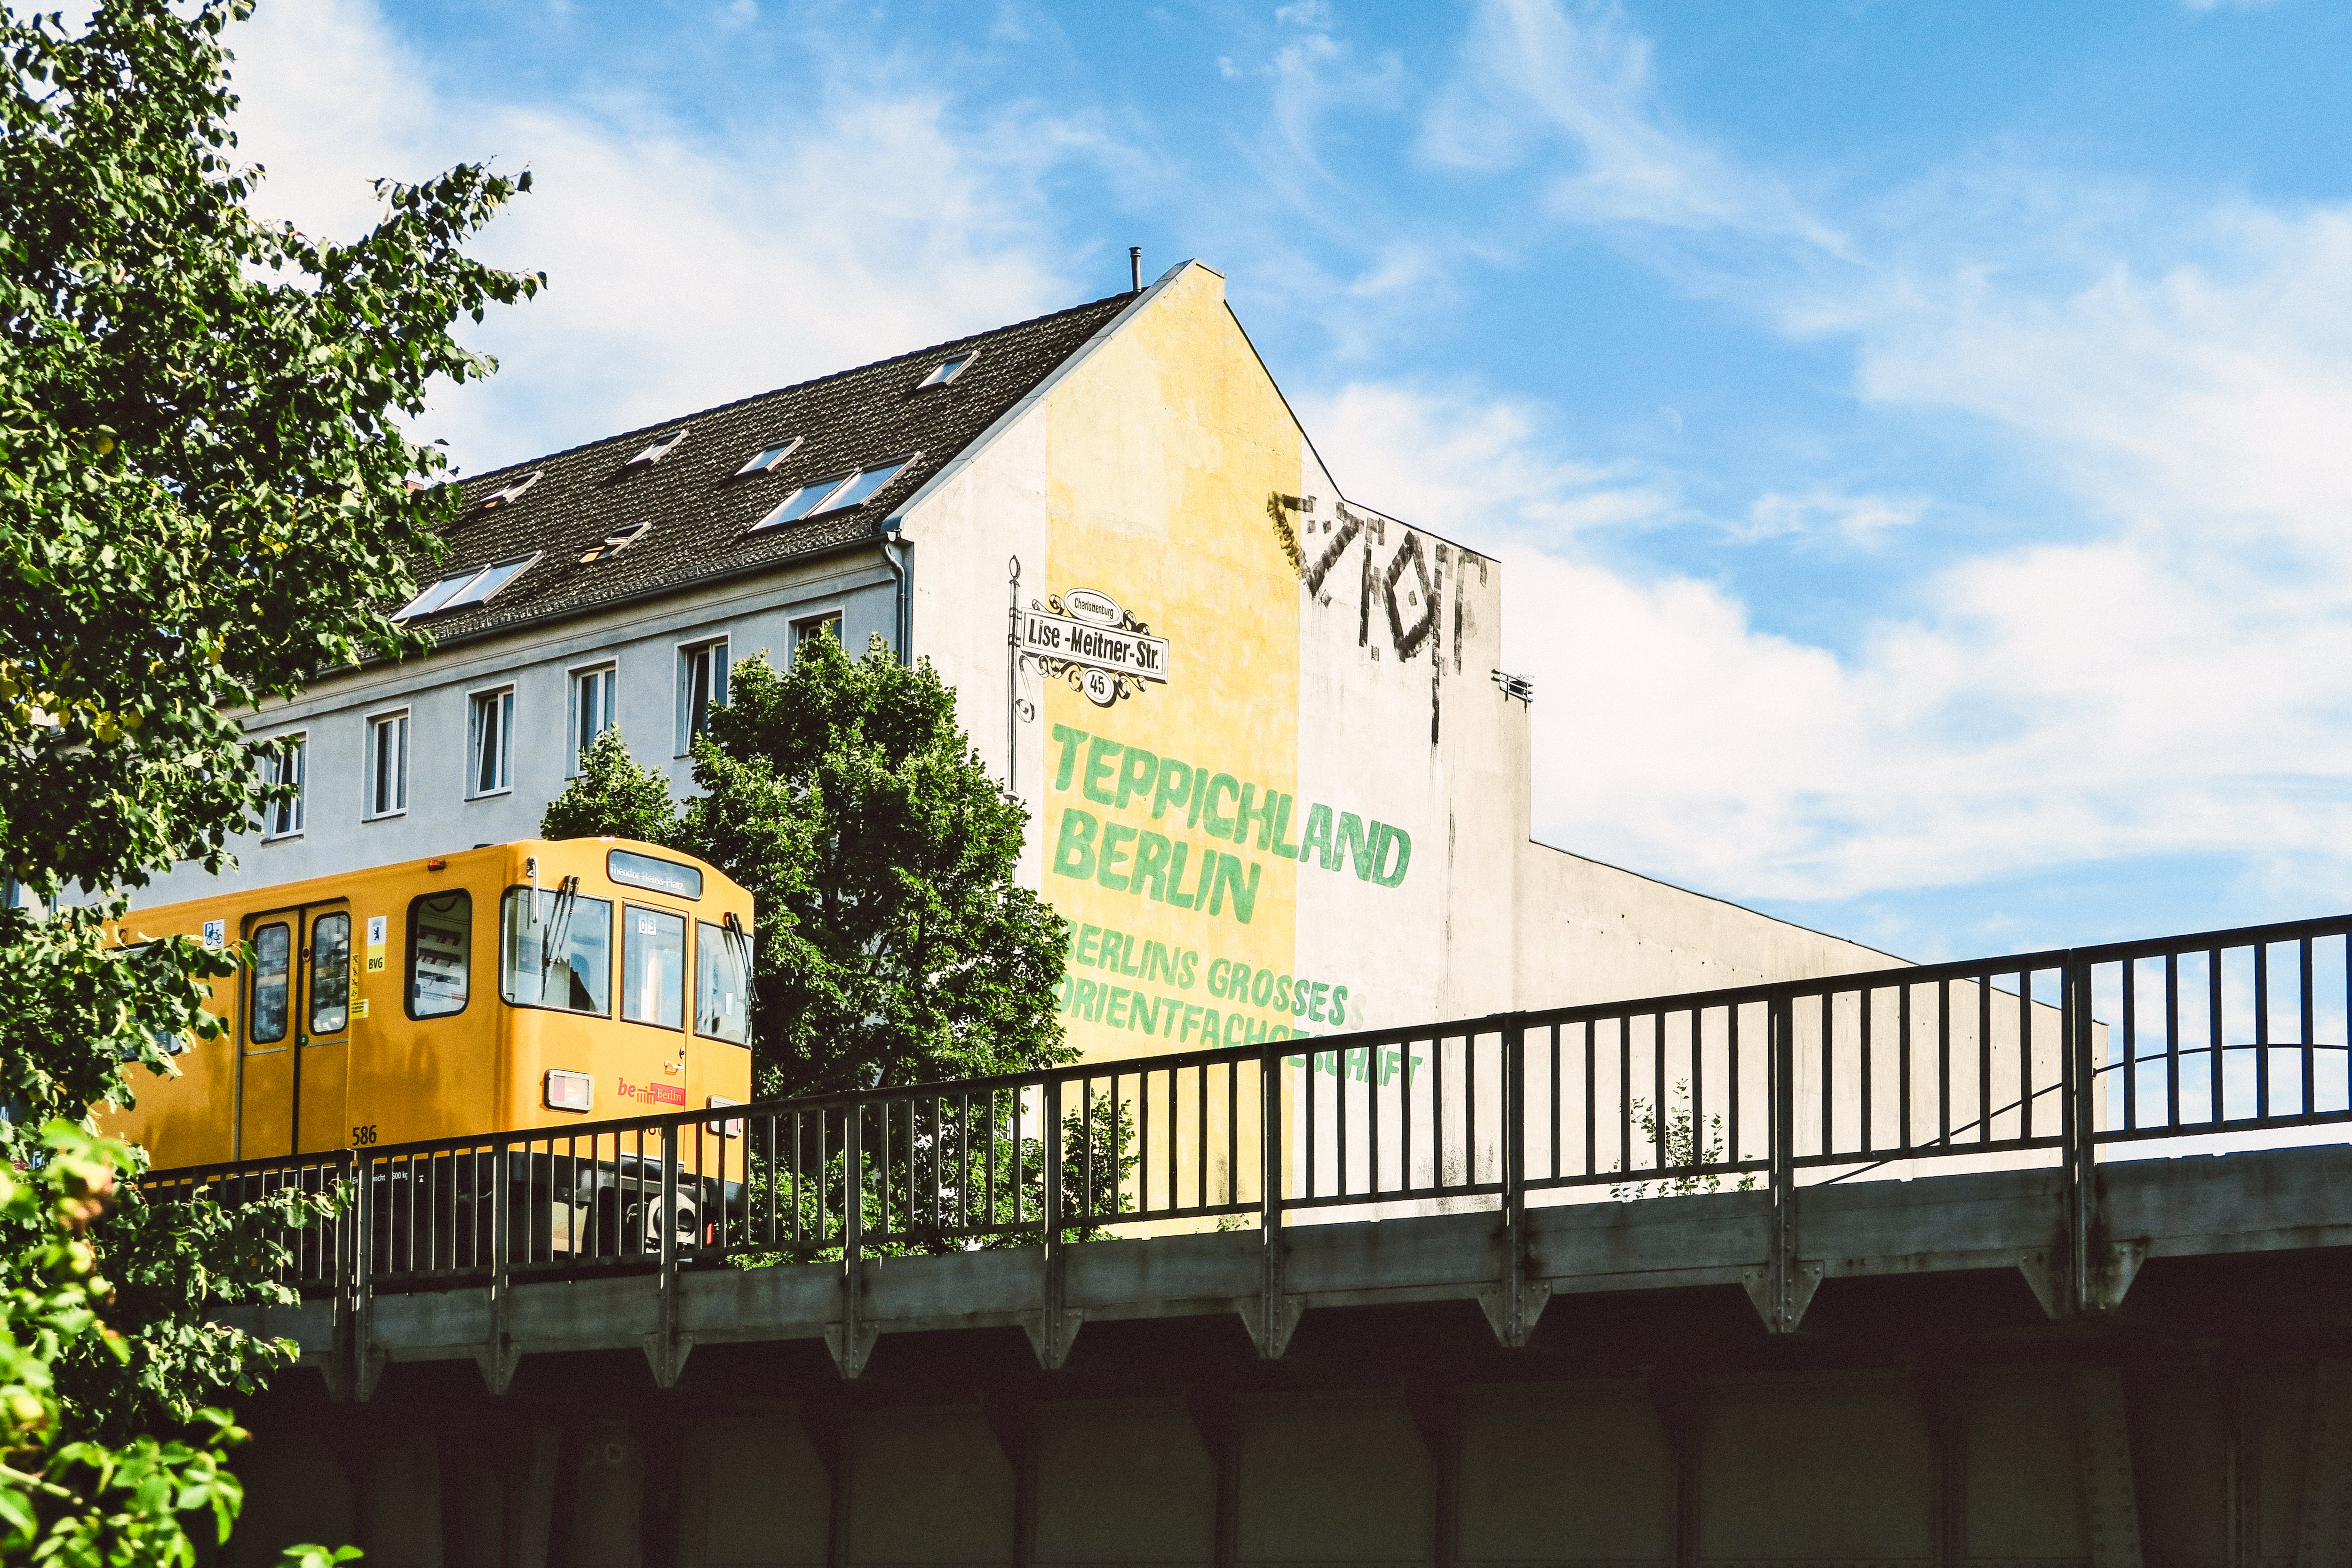 Yellow Train Beside Teppichland Berun Building